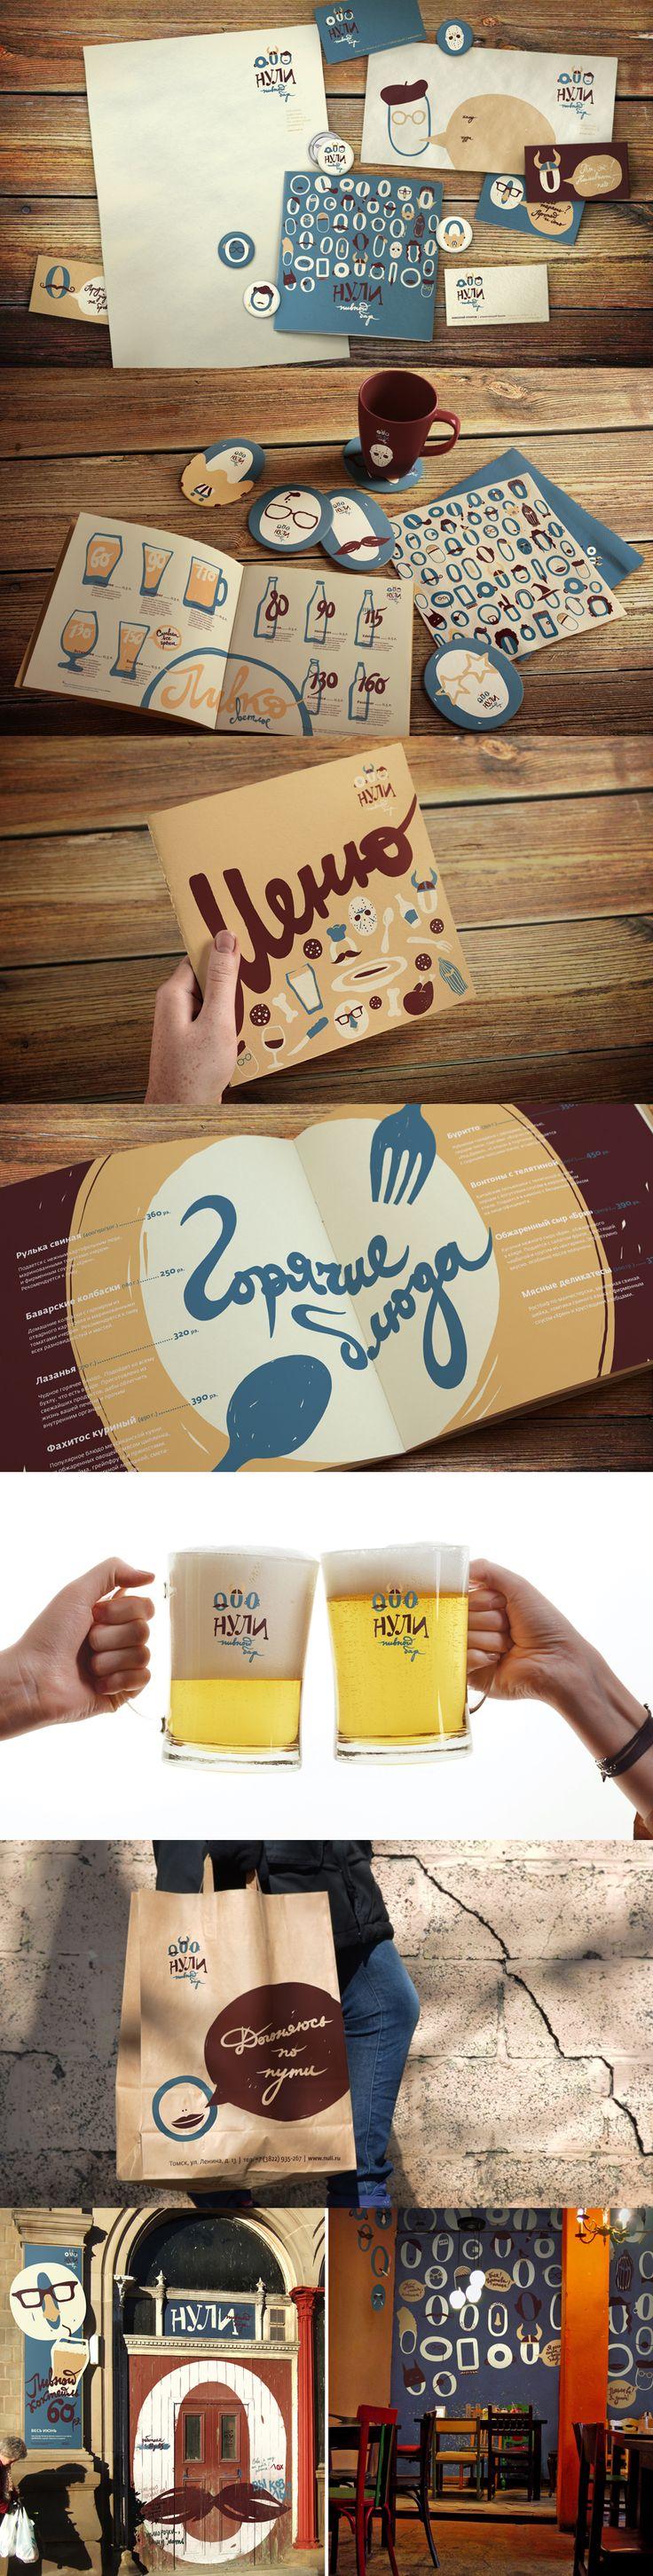 Designer: Катя Тетёркина Branding, Design, Full Stationary, Menu, Restaurant, Logo, Various Application, 2-3 Spot colour, Rustic, Organic, Brown & Blue, Creative